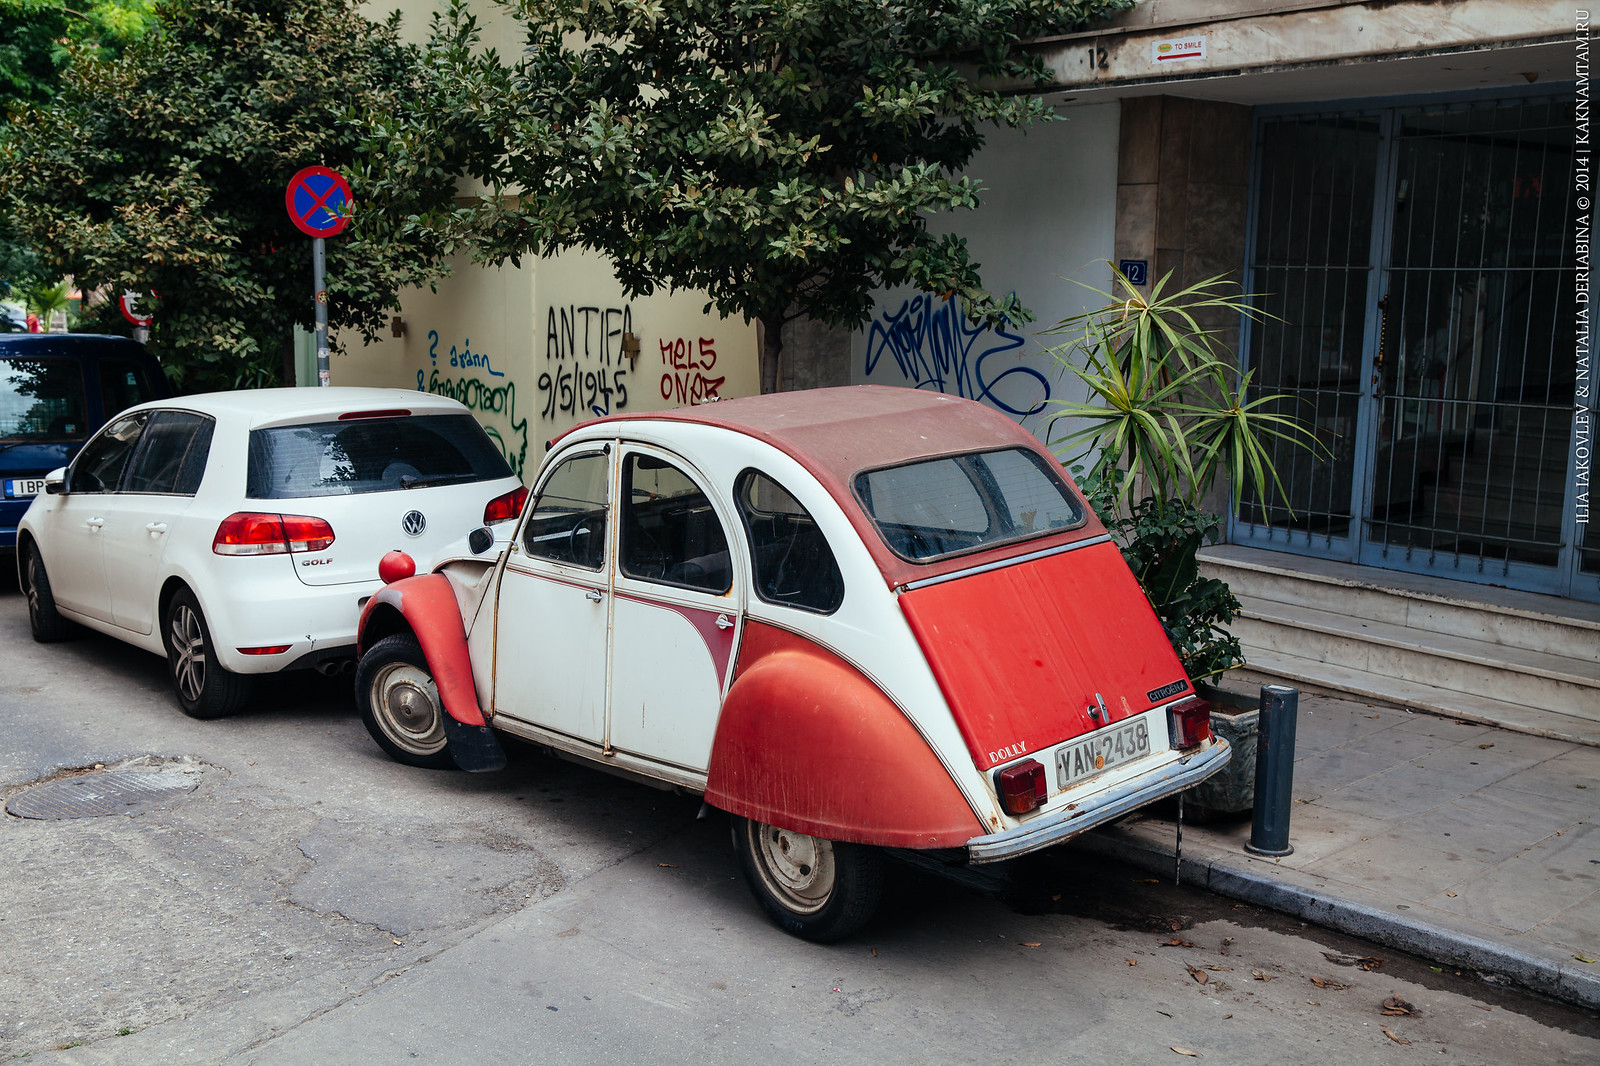 20140618-012-Athens.jpg